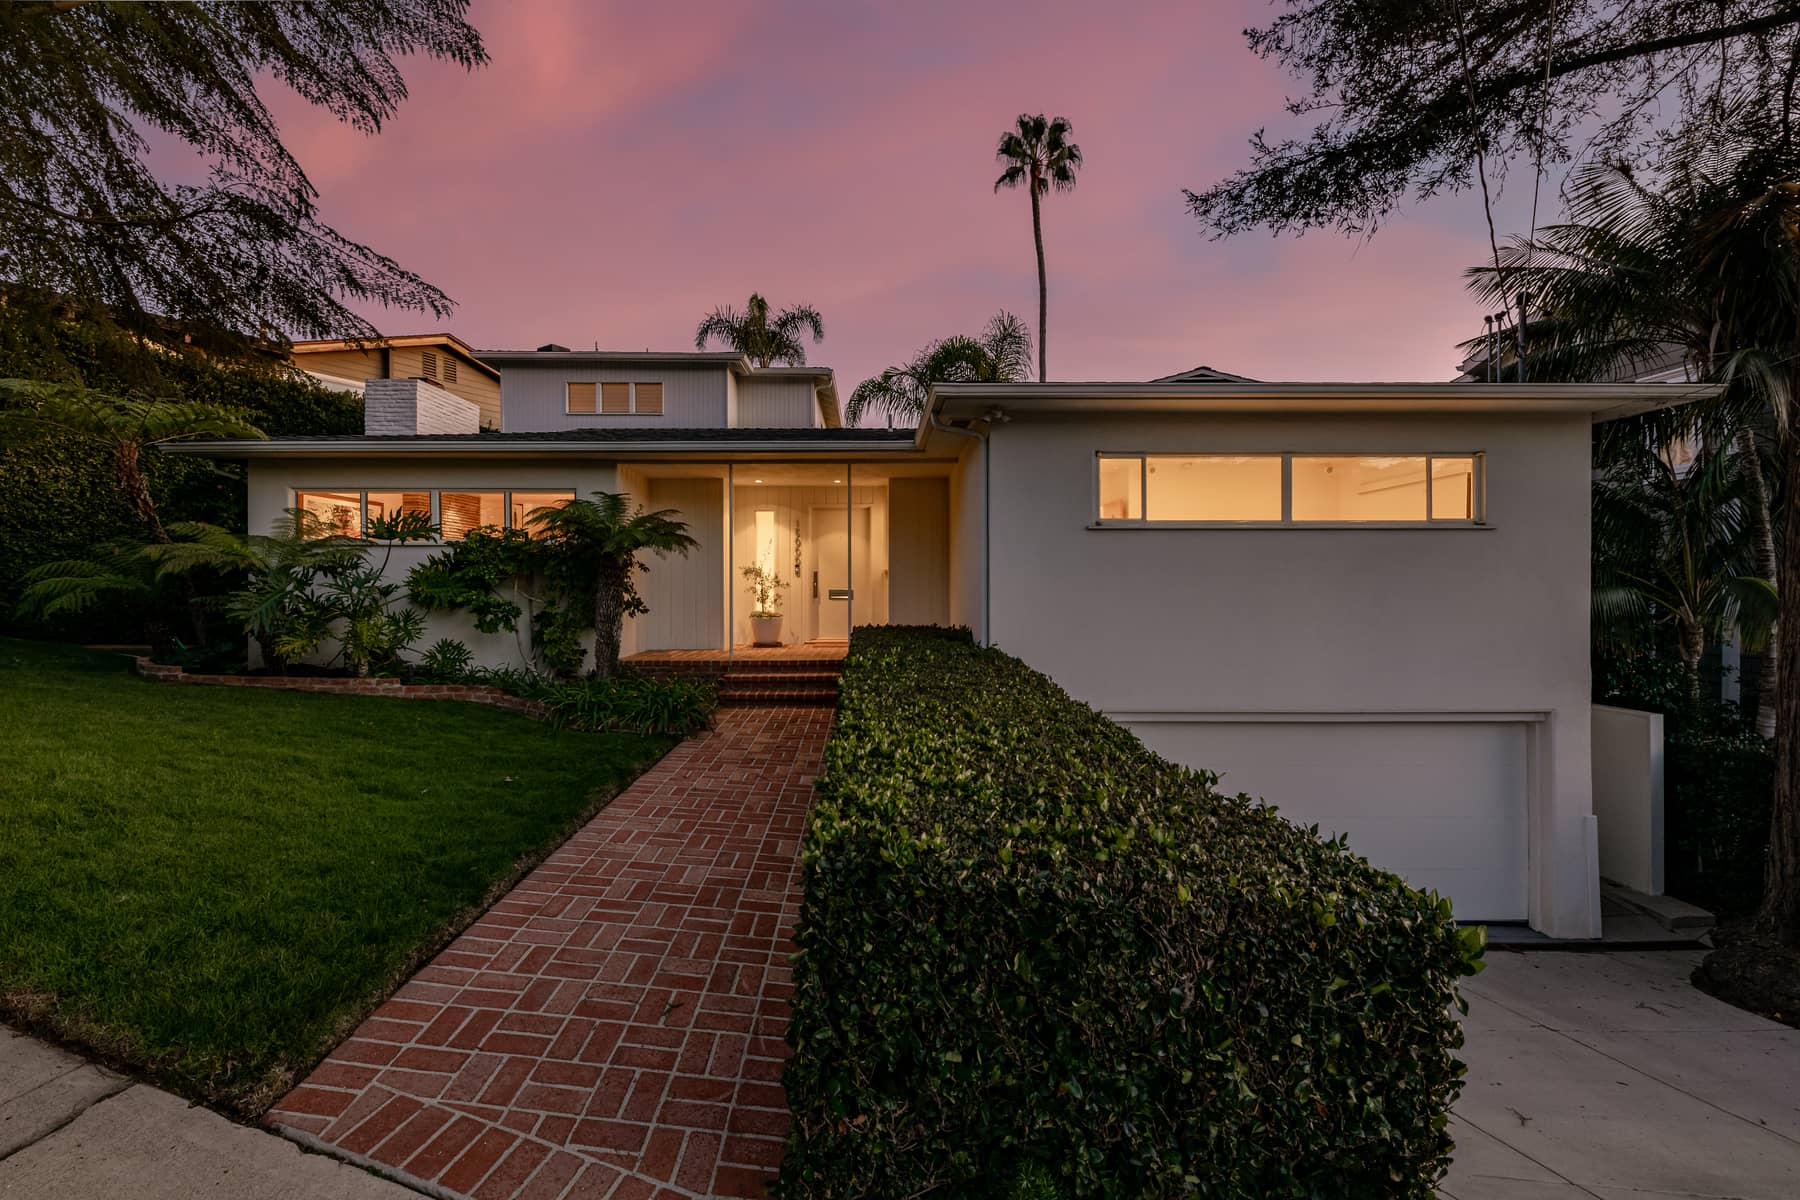 15000 Mc Kendree, Pacific Palisades, California 90272, 3 Bedrooms Bedrooms, ,2.5 BathroomsBathrooms,Home,For Sale,Mc Kendree,1123